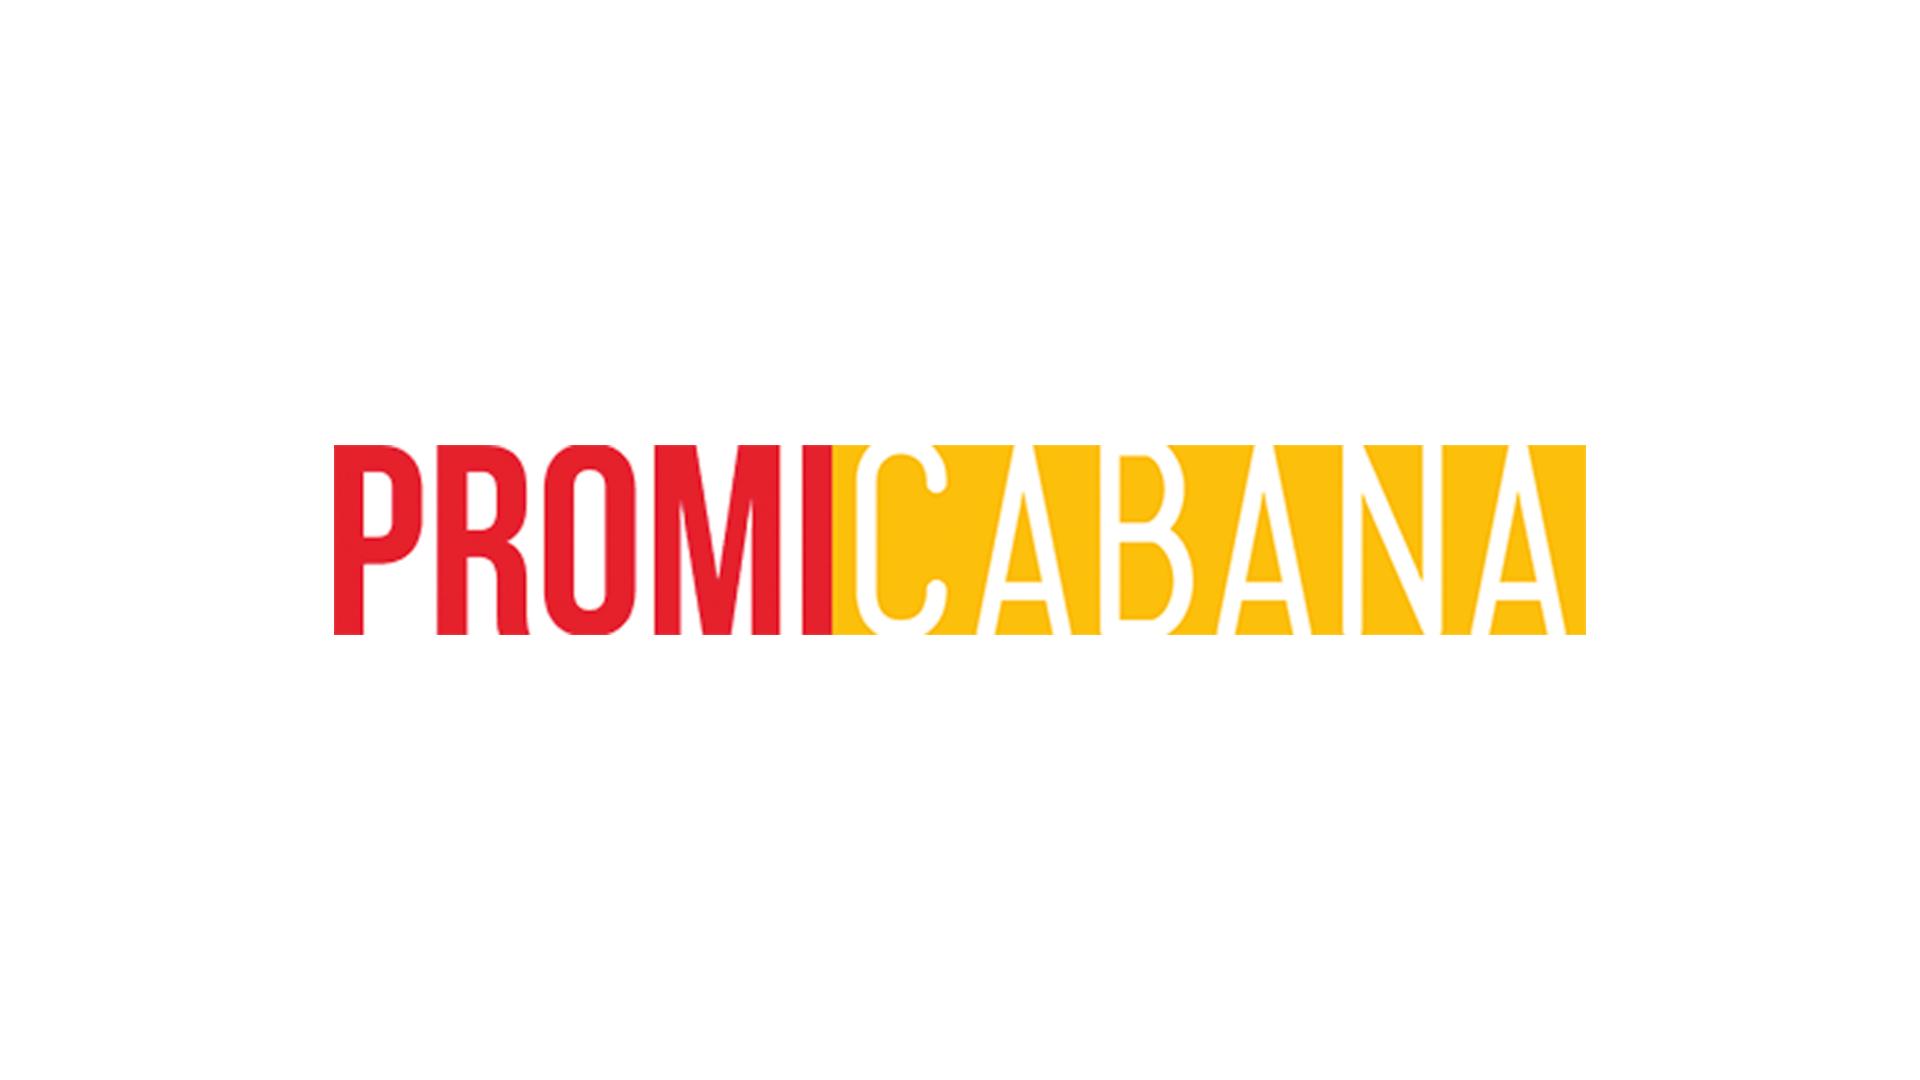 Bradley-Cooper-Ben-Affleck-Amanda-Seyfried-Amy-Adams-Hollywood-Film-Awards